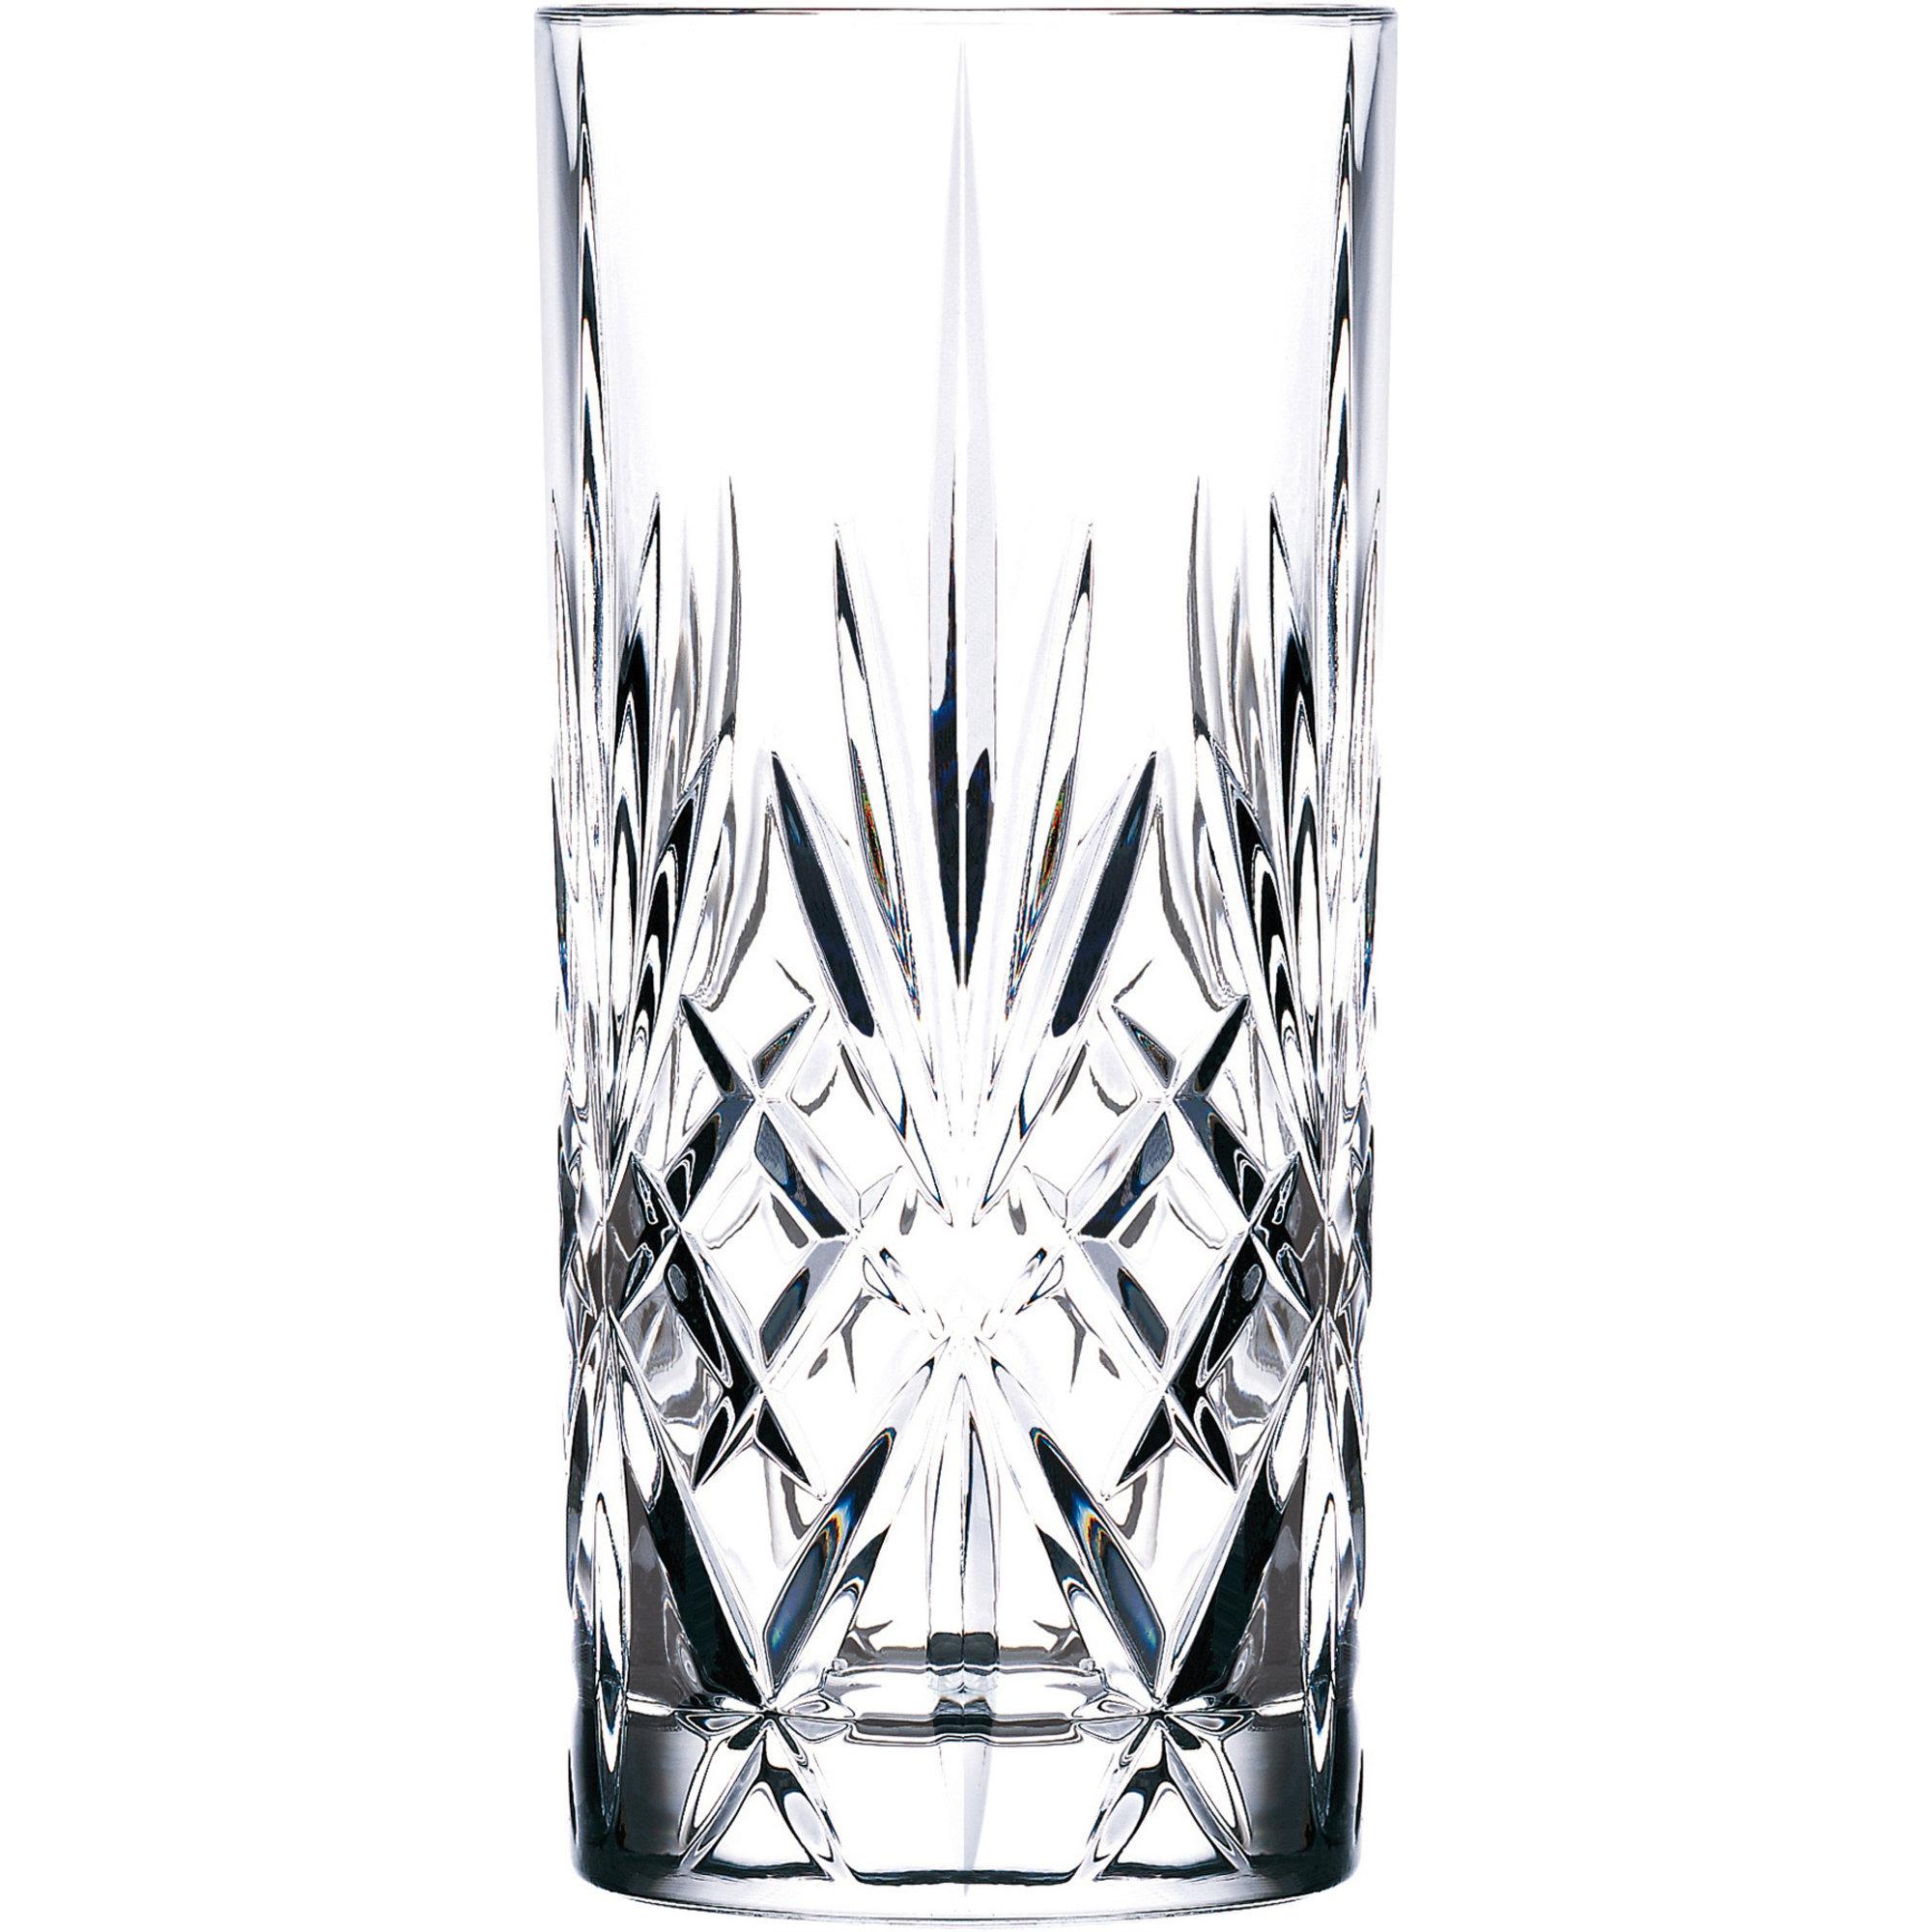 Lyngby Lyngby Highballglas 6 stk